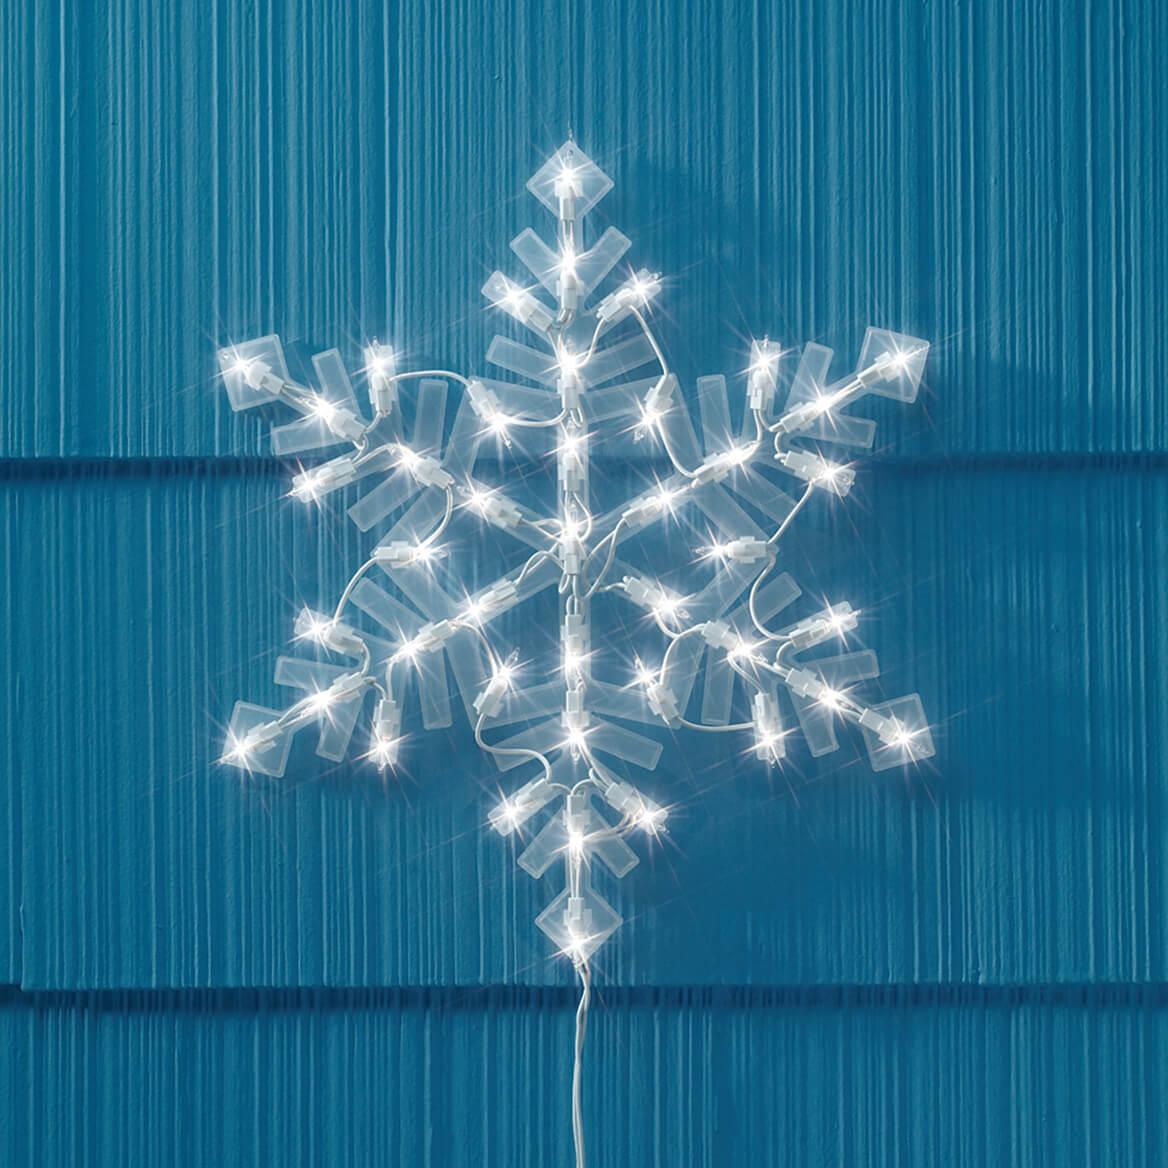 Lighted Snowflake-325257